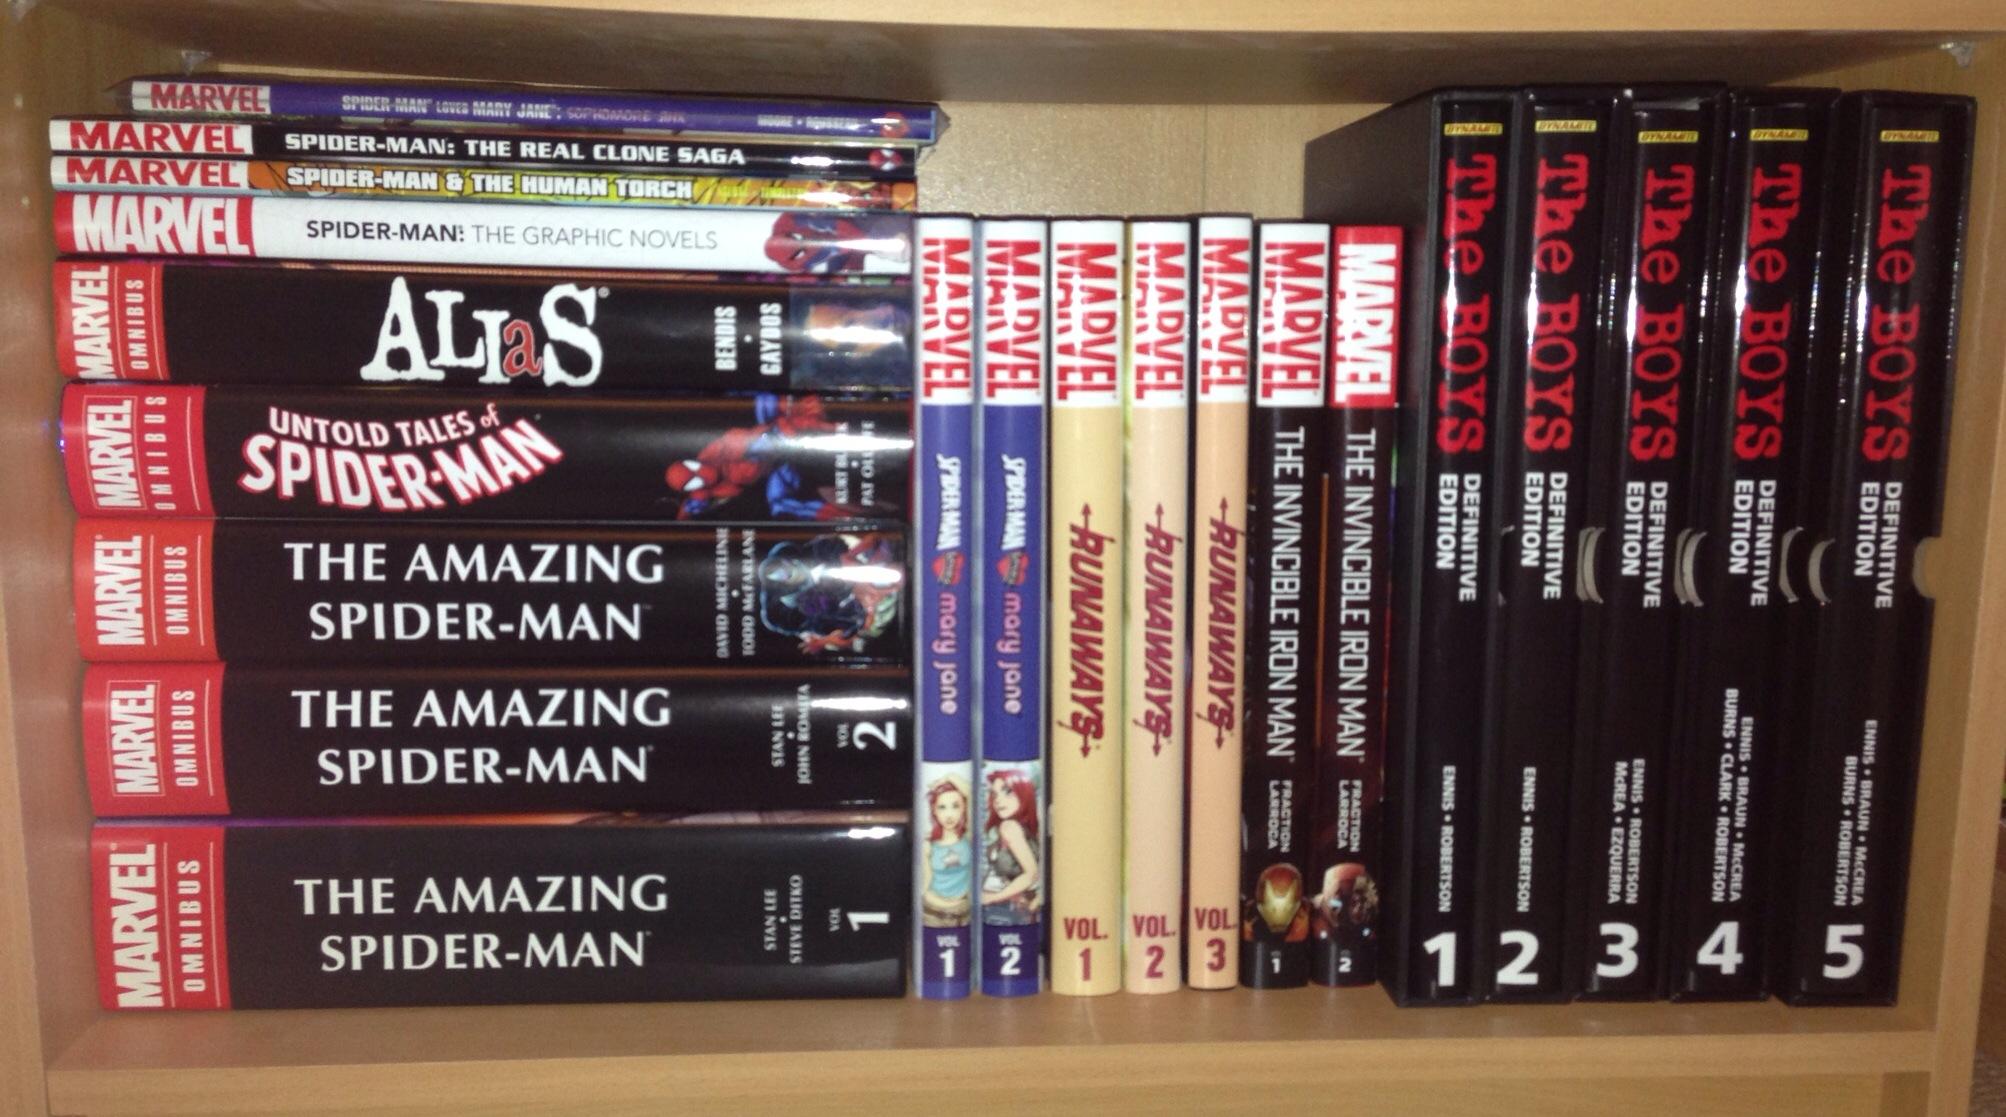 Kerry's Marvel books